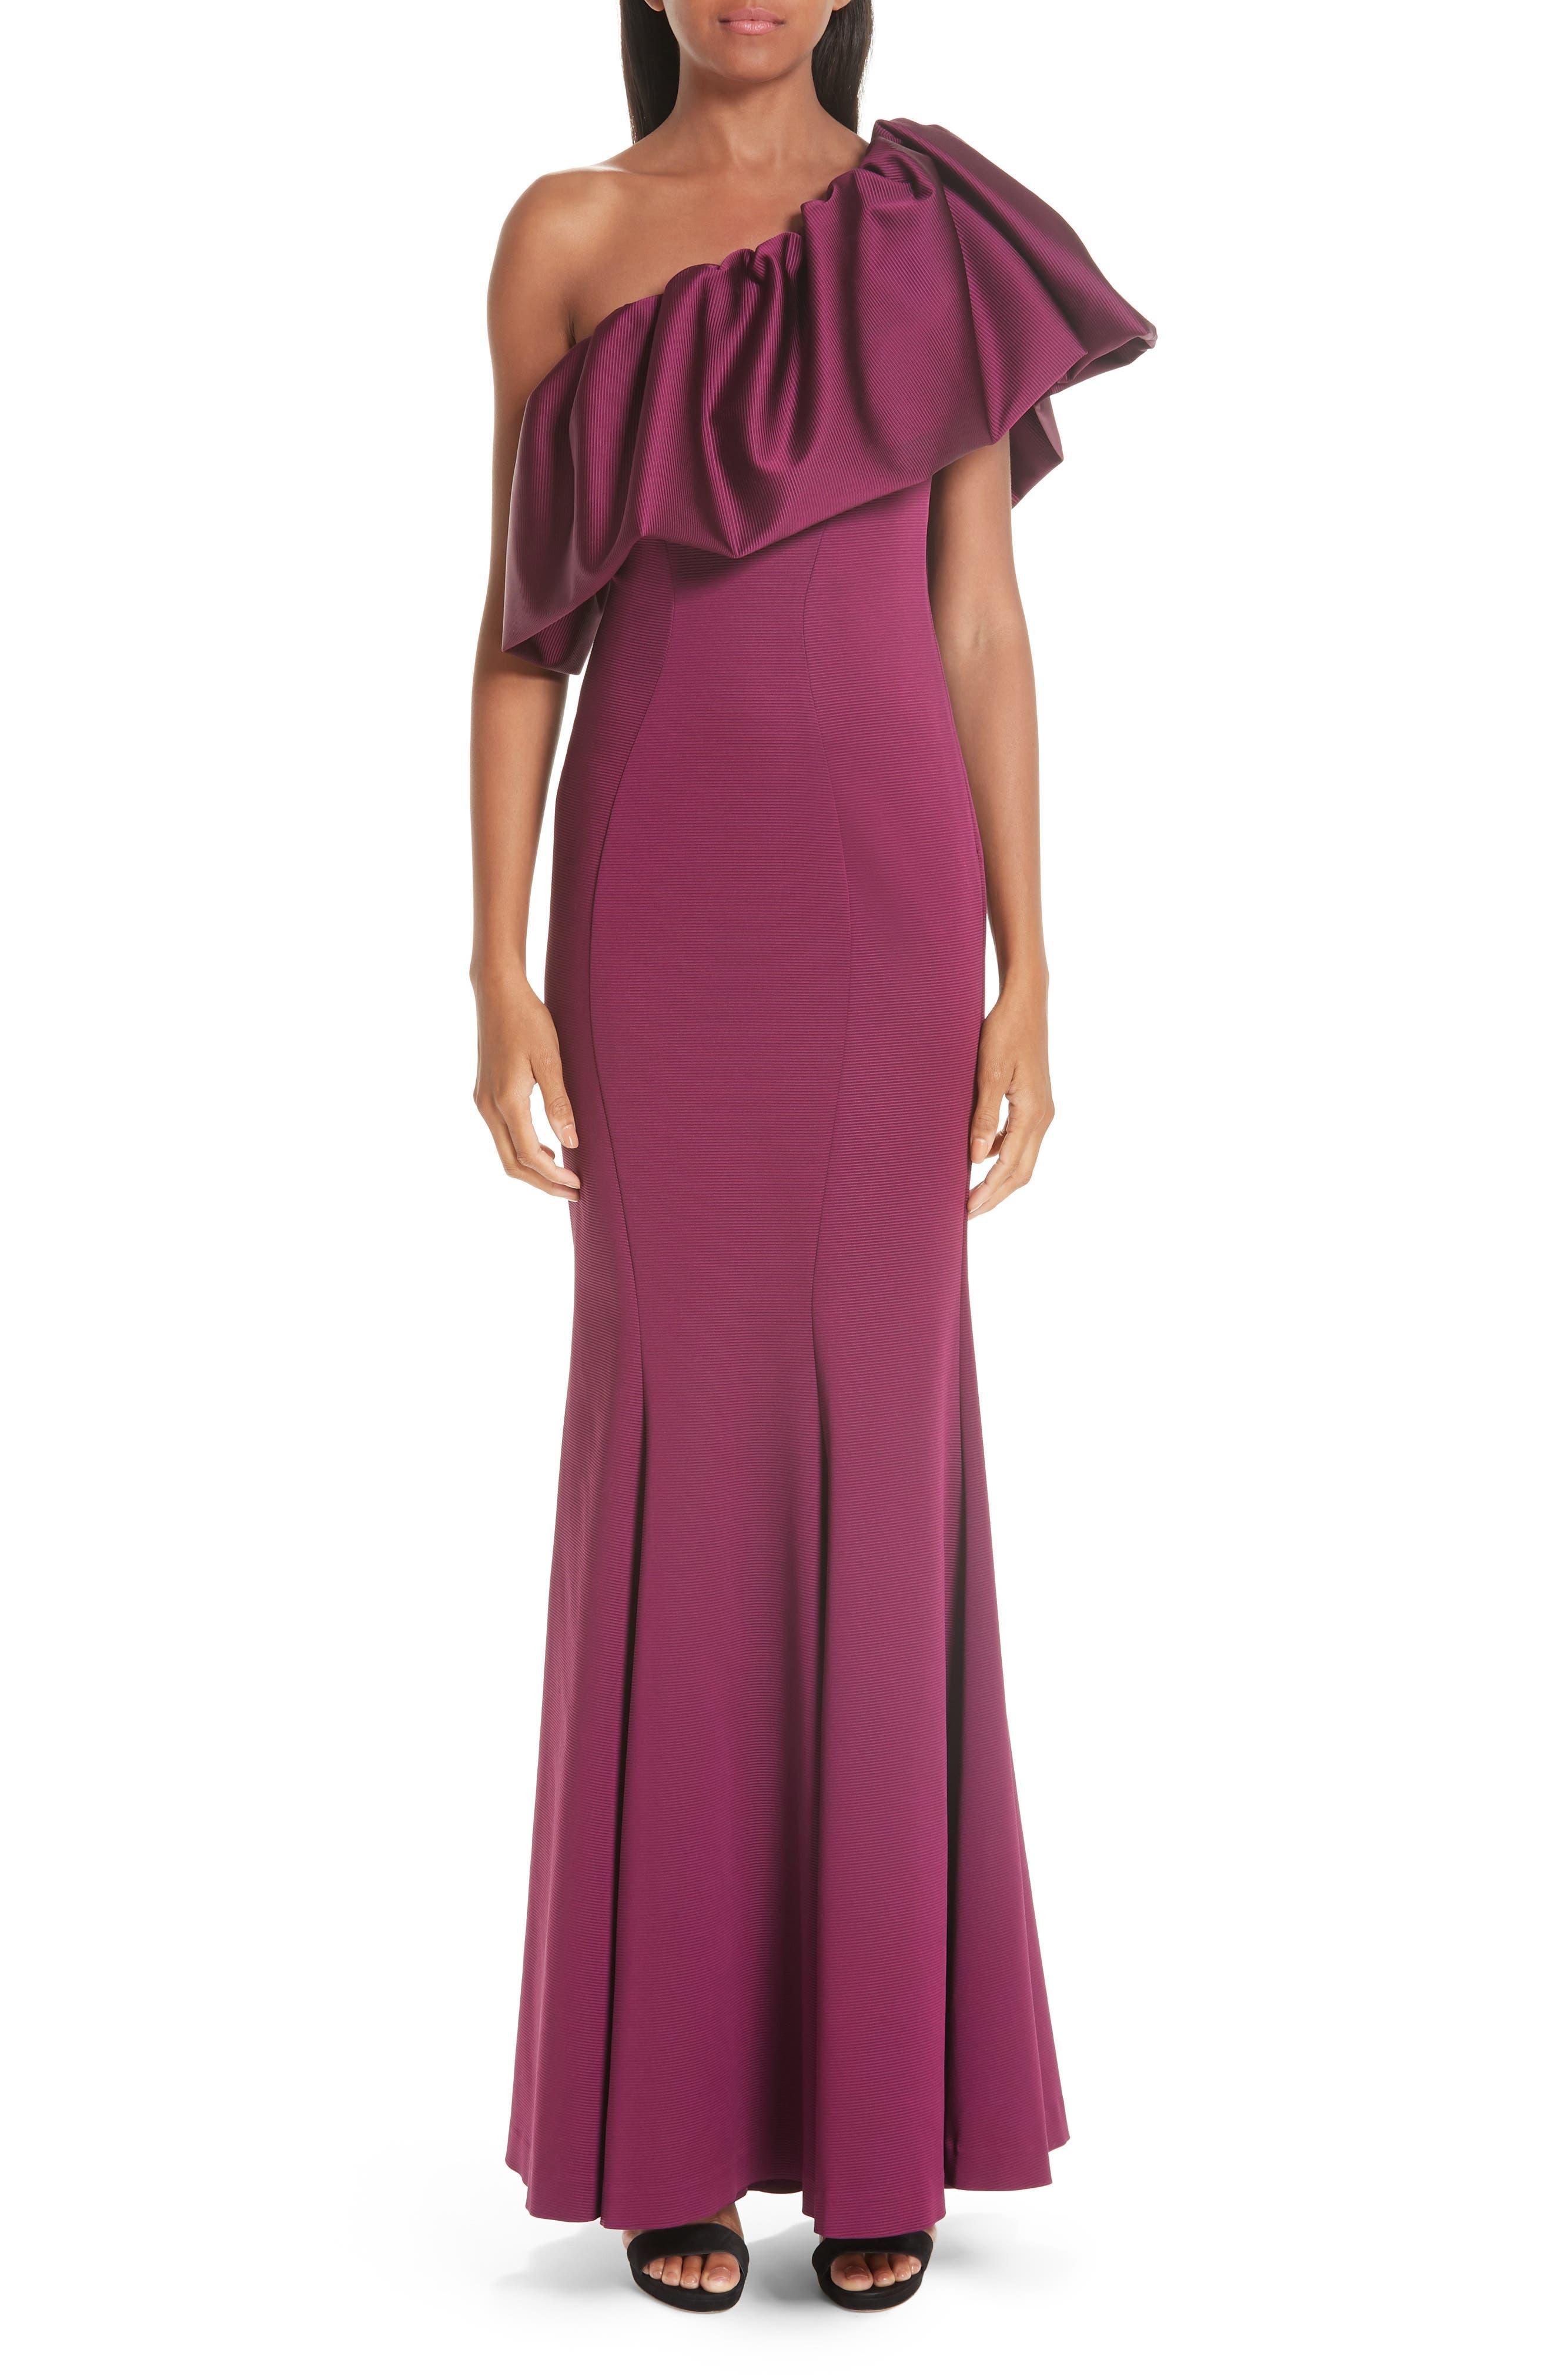 Zac Zac Posen Vaille One-Shoulder Ruffle Evening Dress, Purple